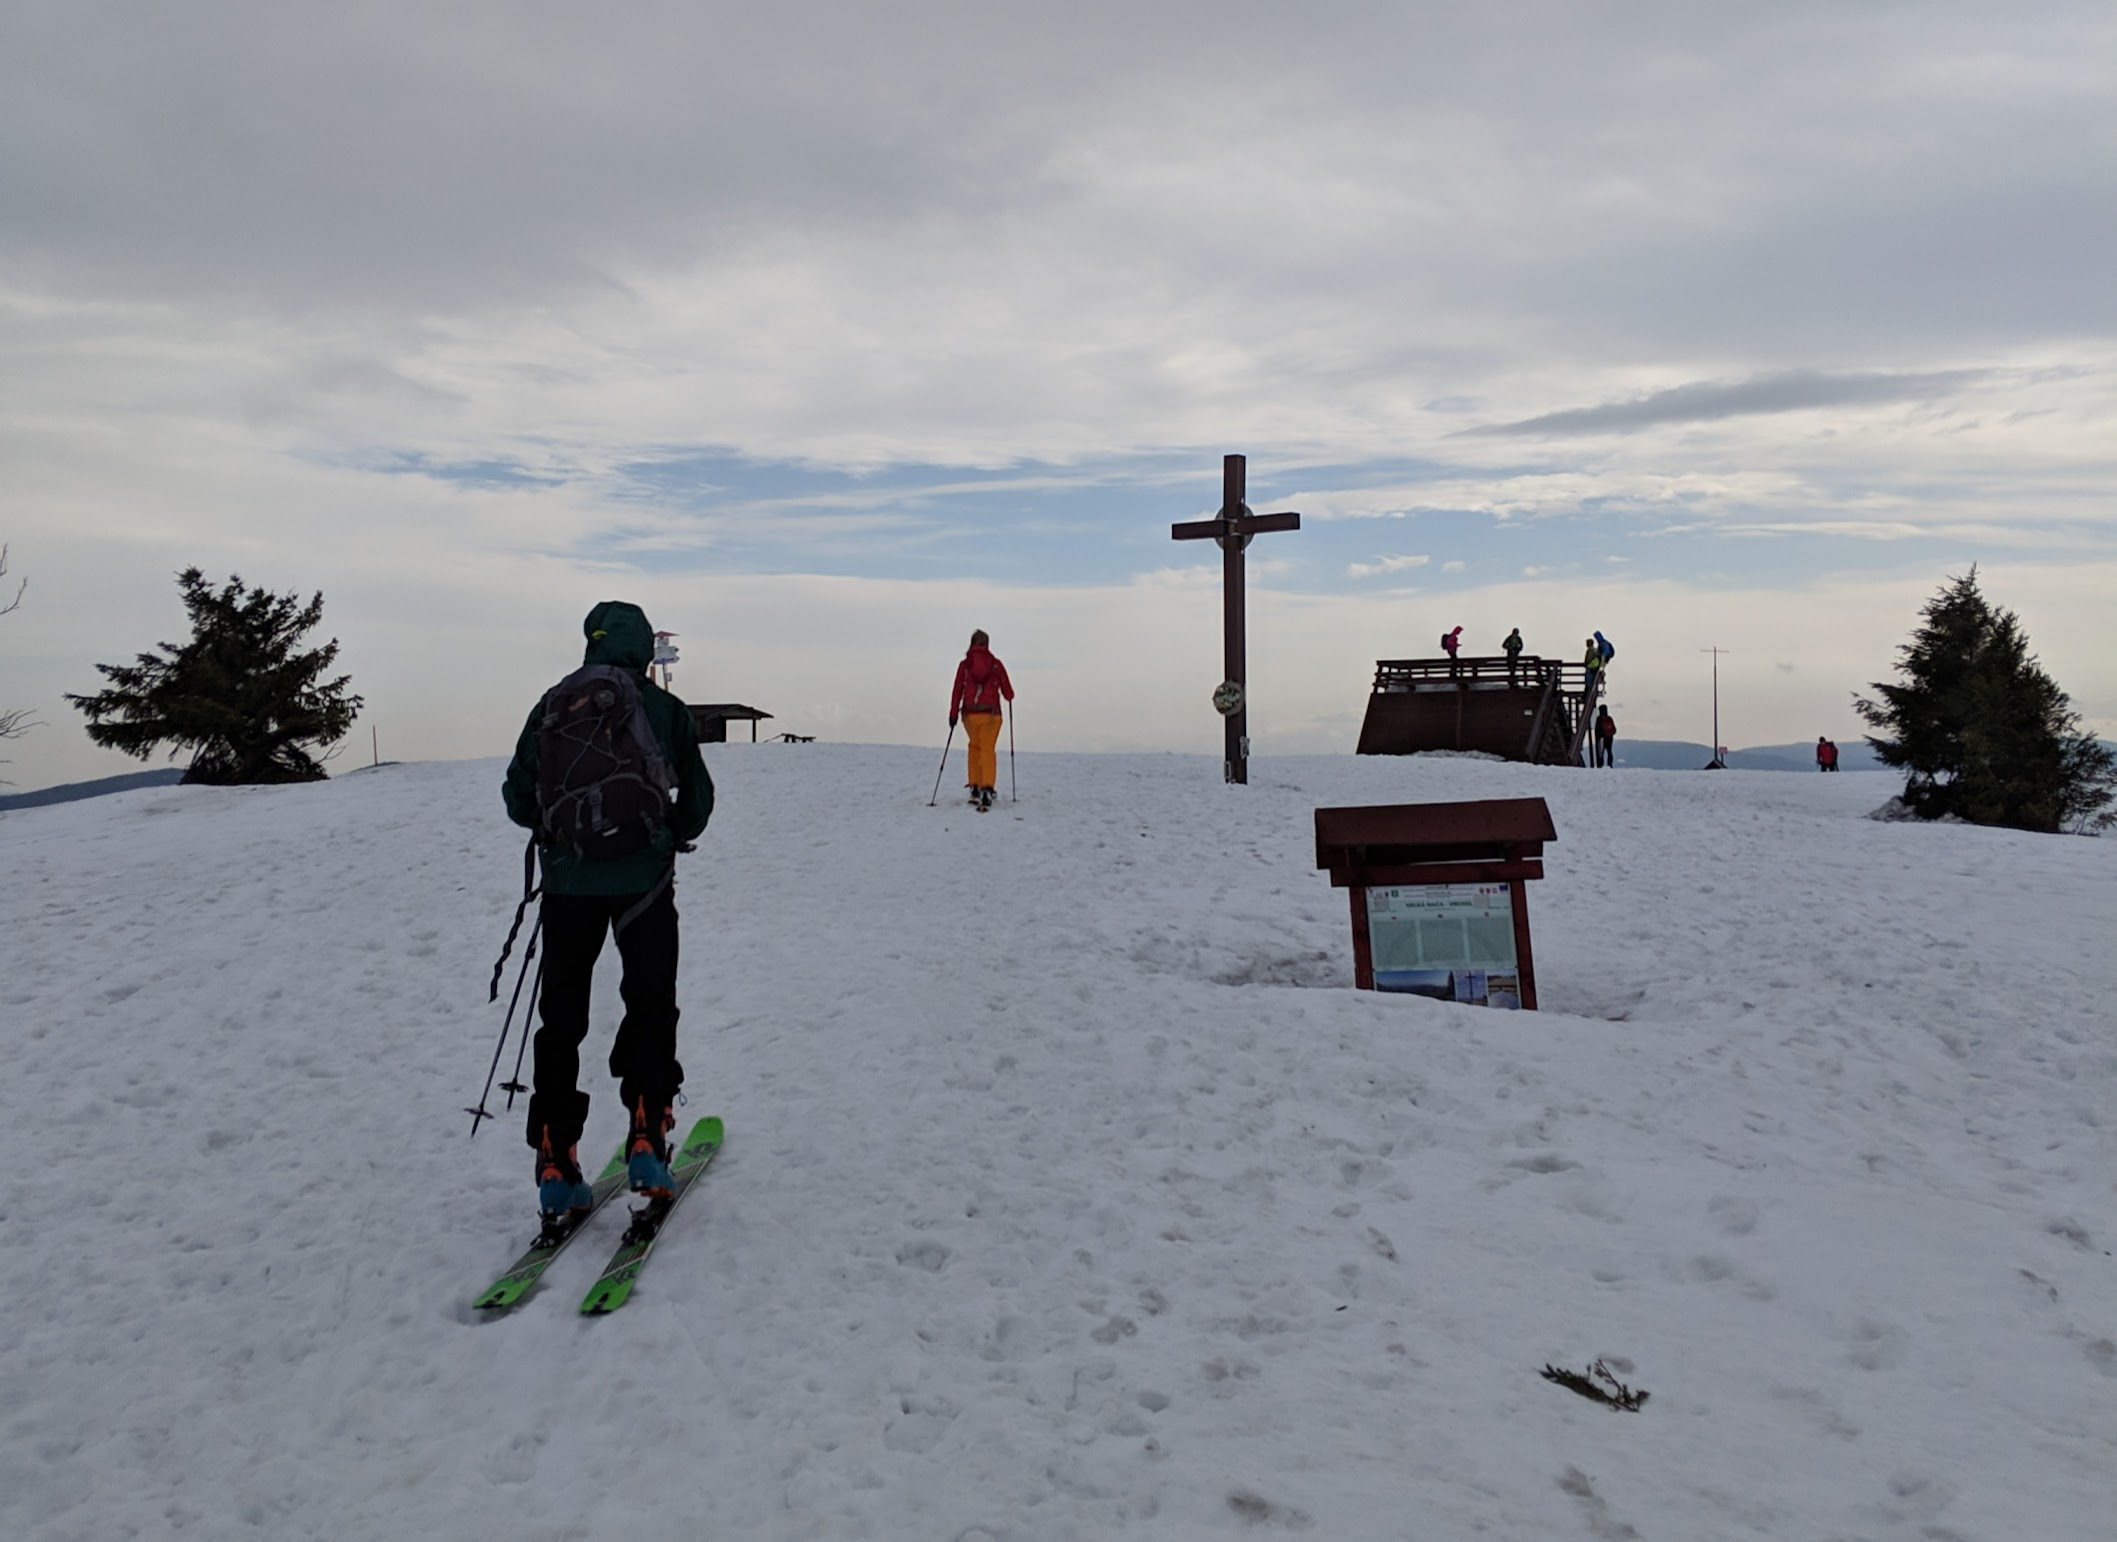 Velka Raca skitour (Slovakia) - Feb 19